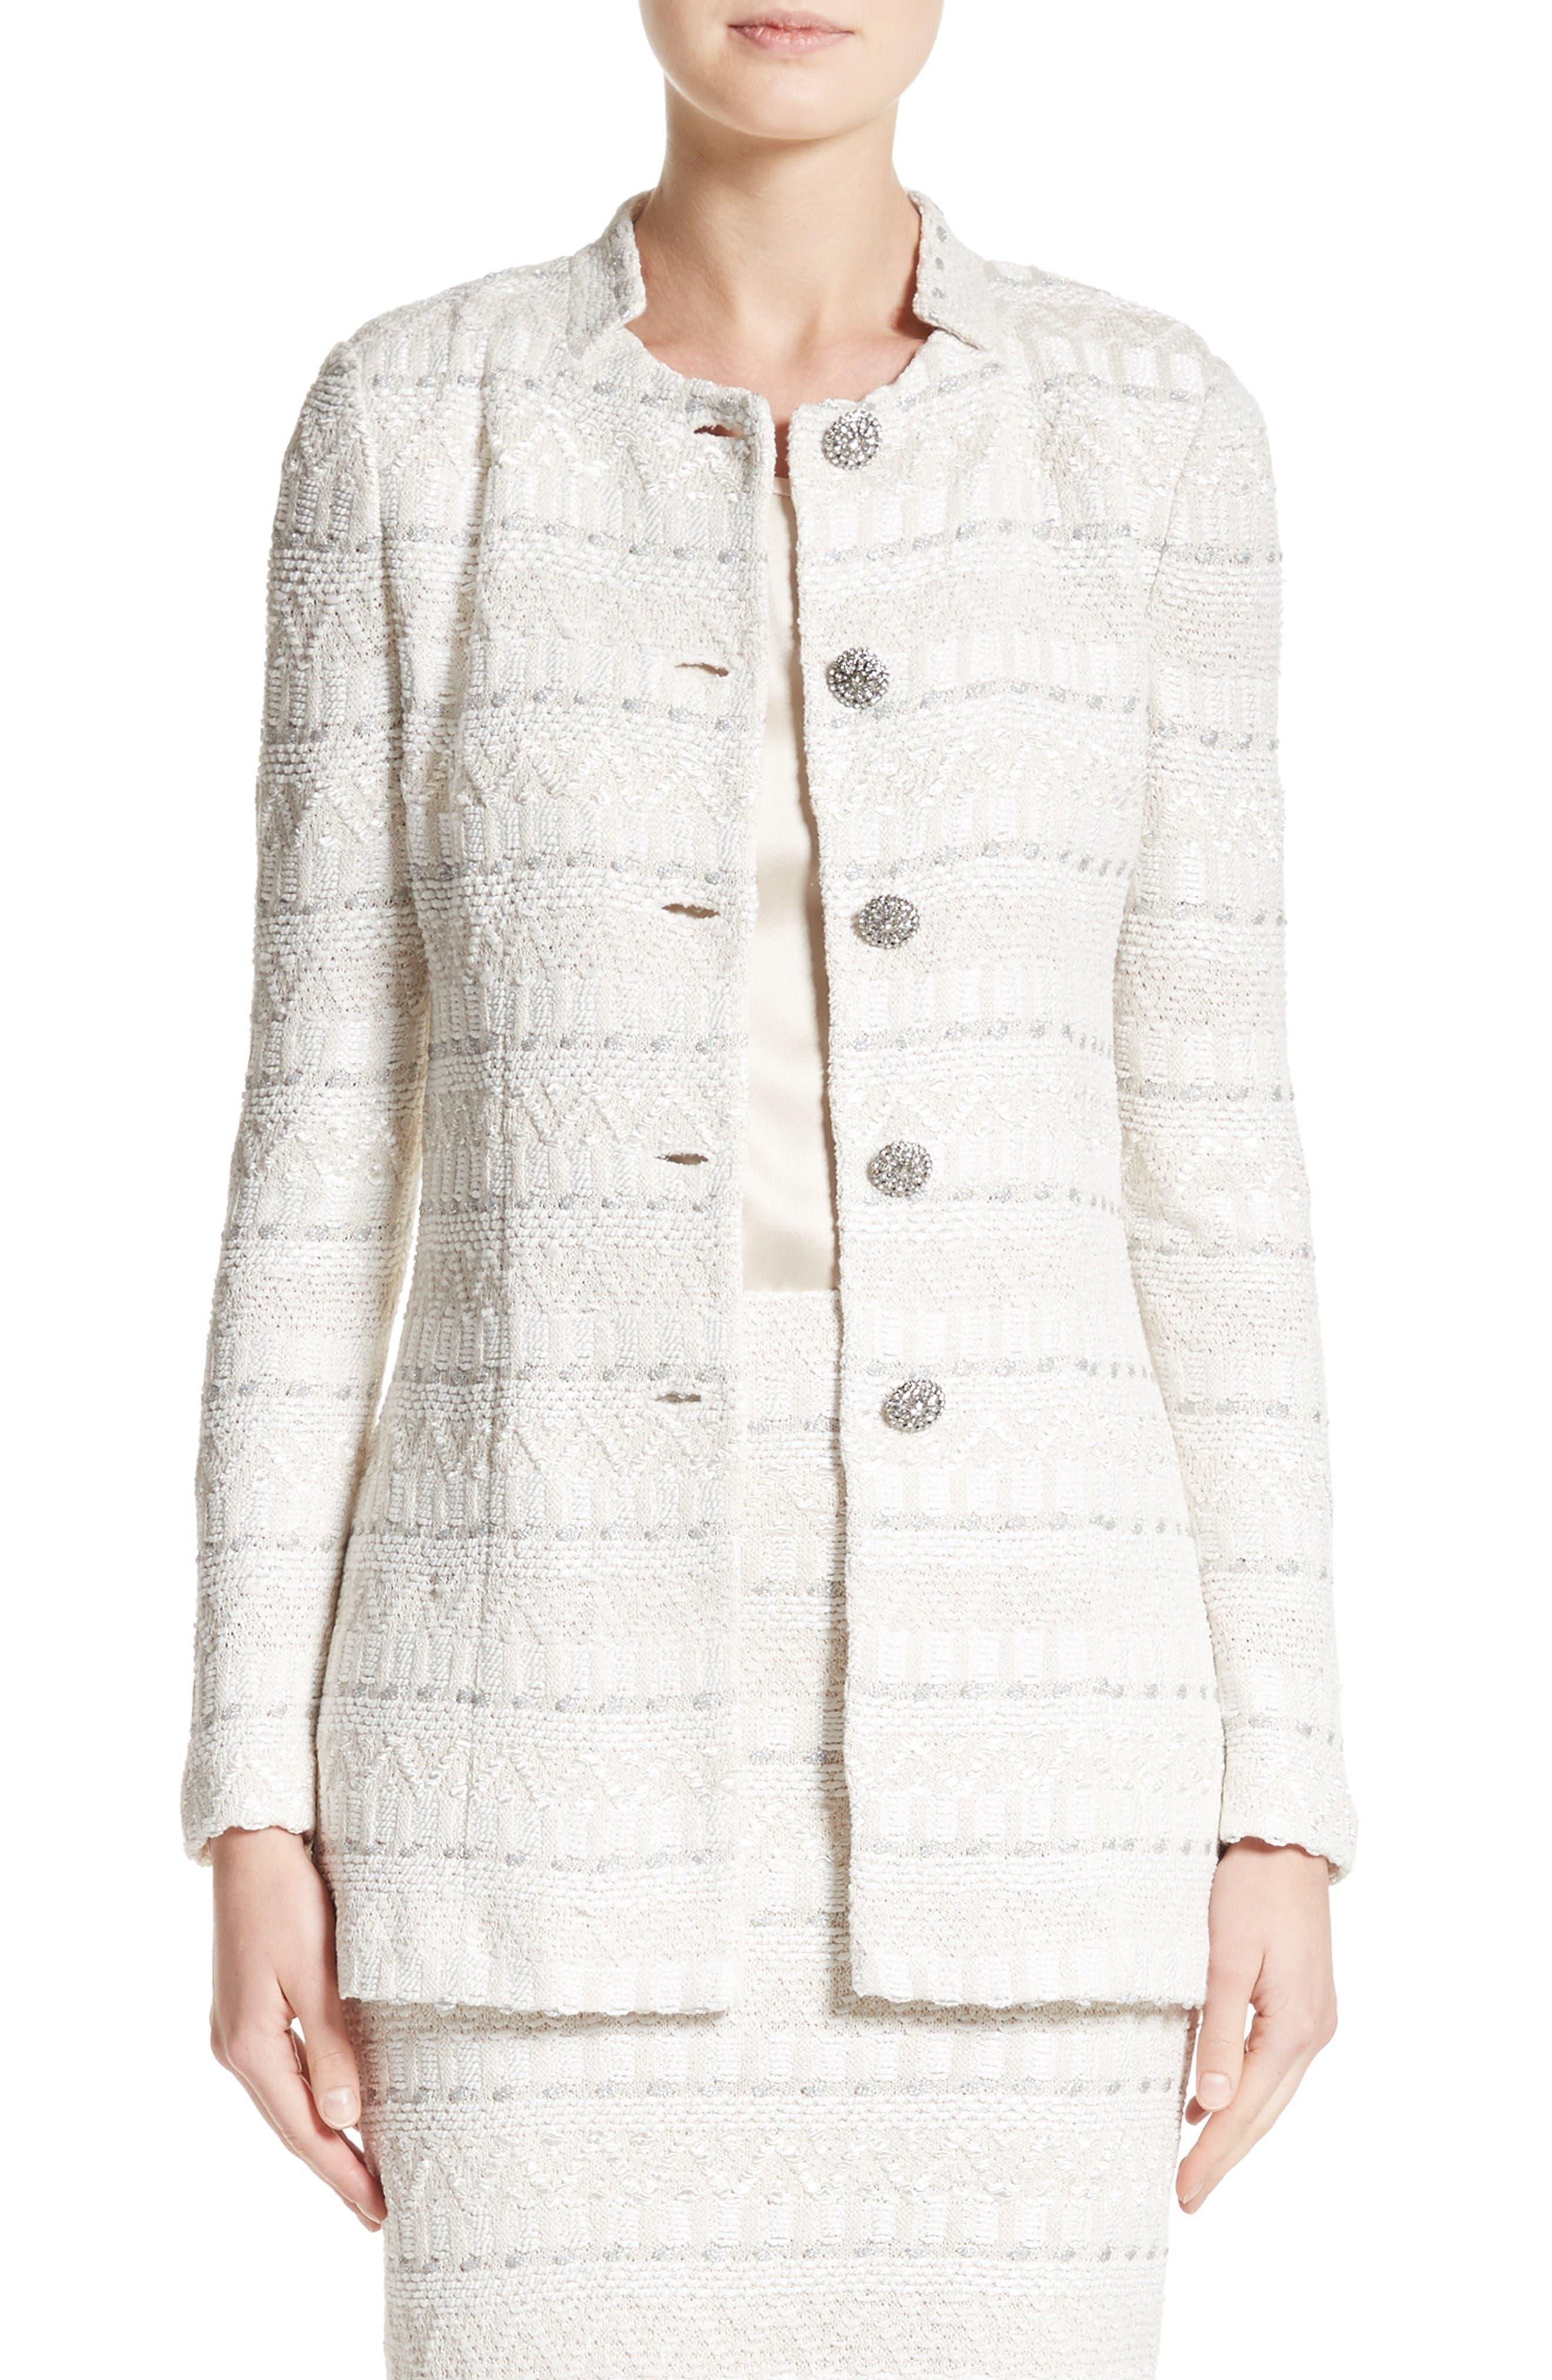 St. John Collection Samar Knit Tweed Jacket